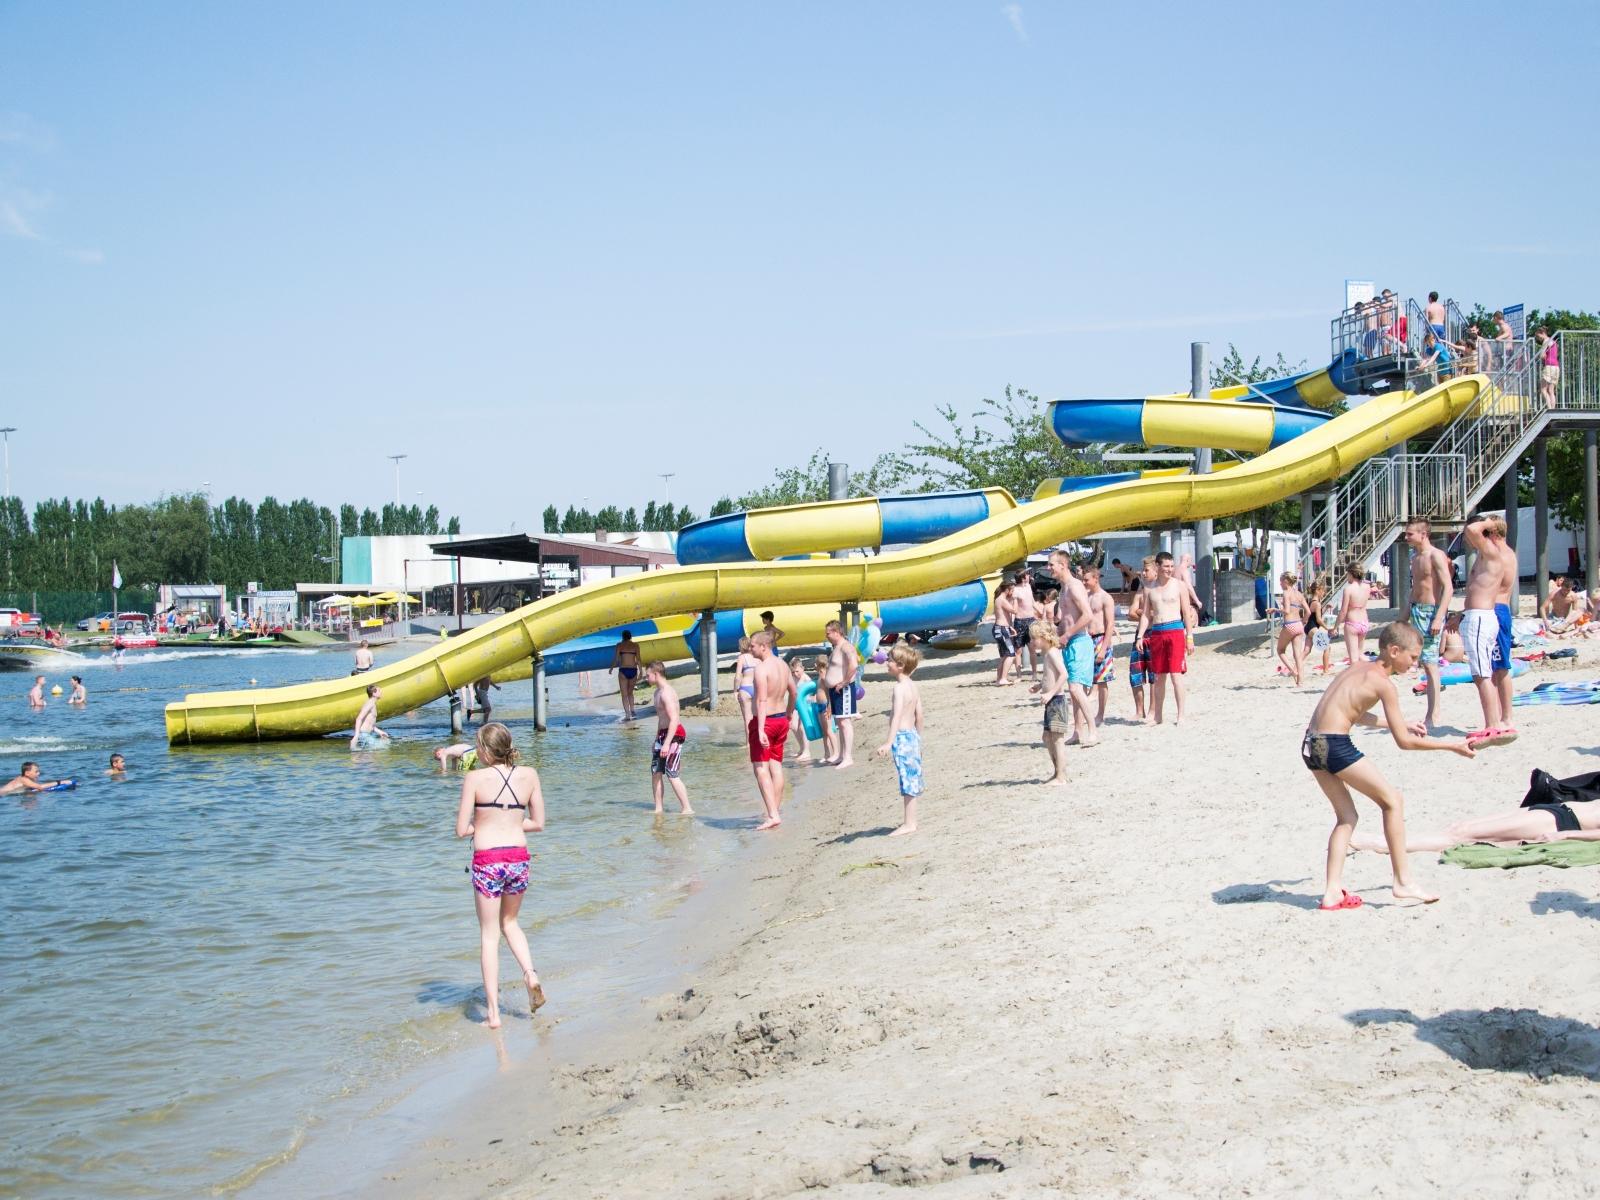 Aanbieding vakantiepark Brugse Ommeland 🏕️Recreatiepark Klein Strand